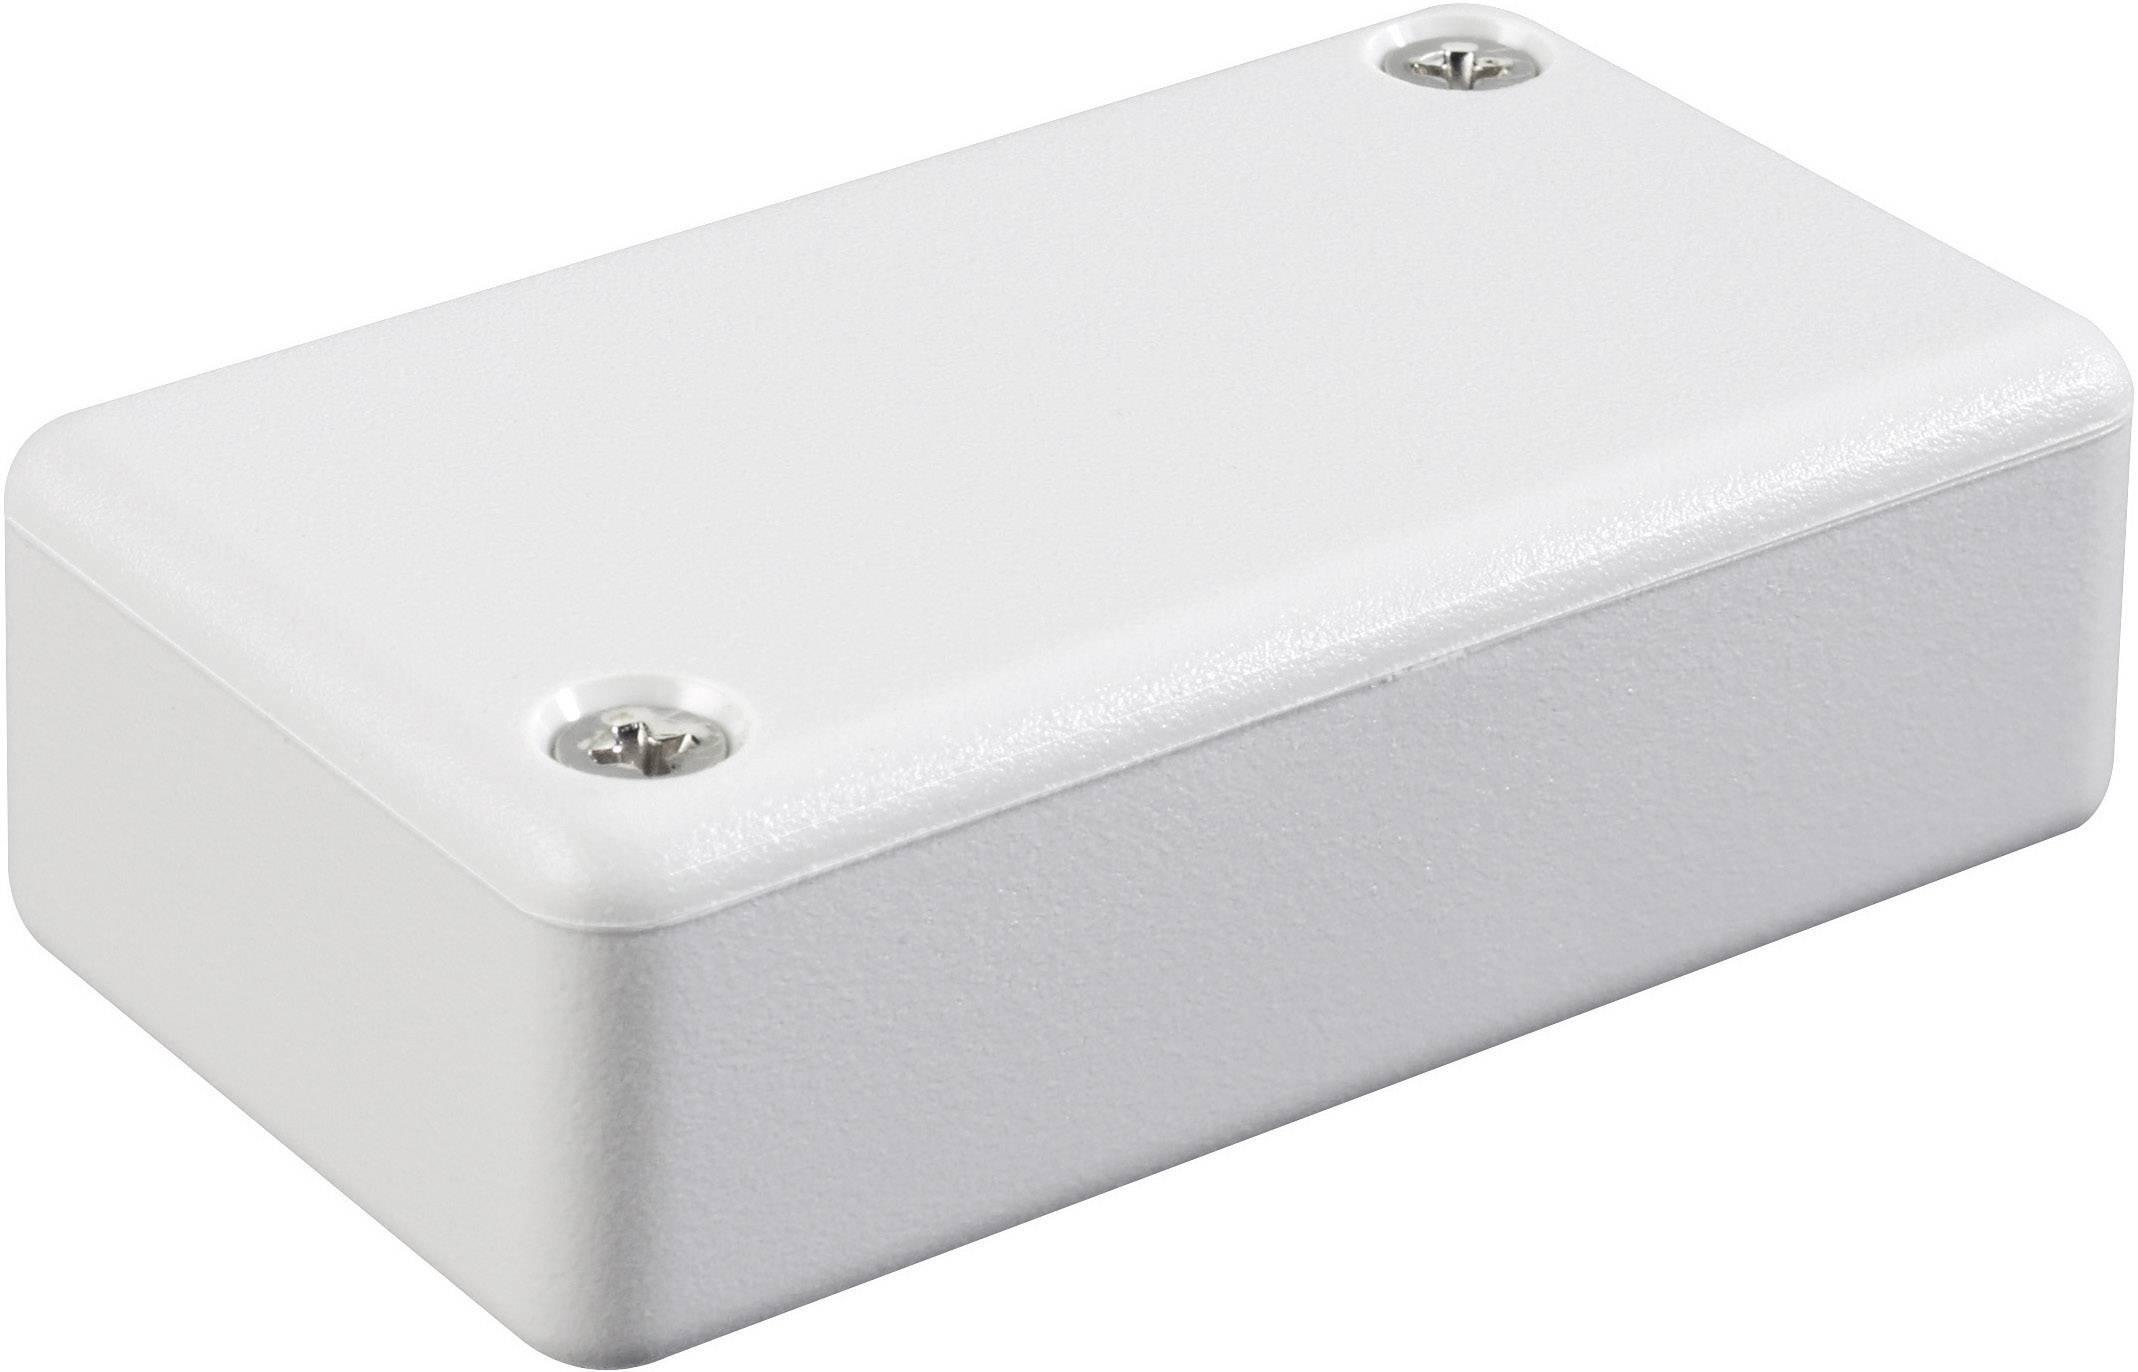 Euro krabice Hammond Electronics 1551HBK 1551HBK, 60 x 35 x 20 , ABS, čierna, 1 ks